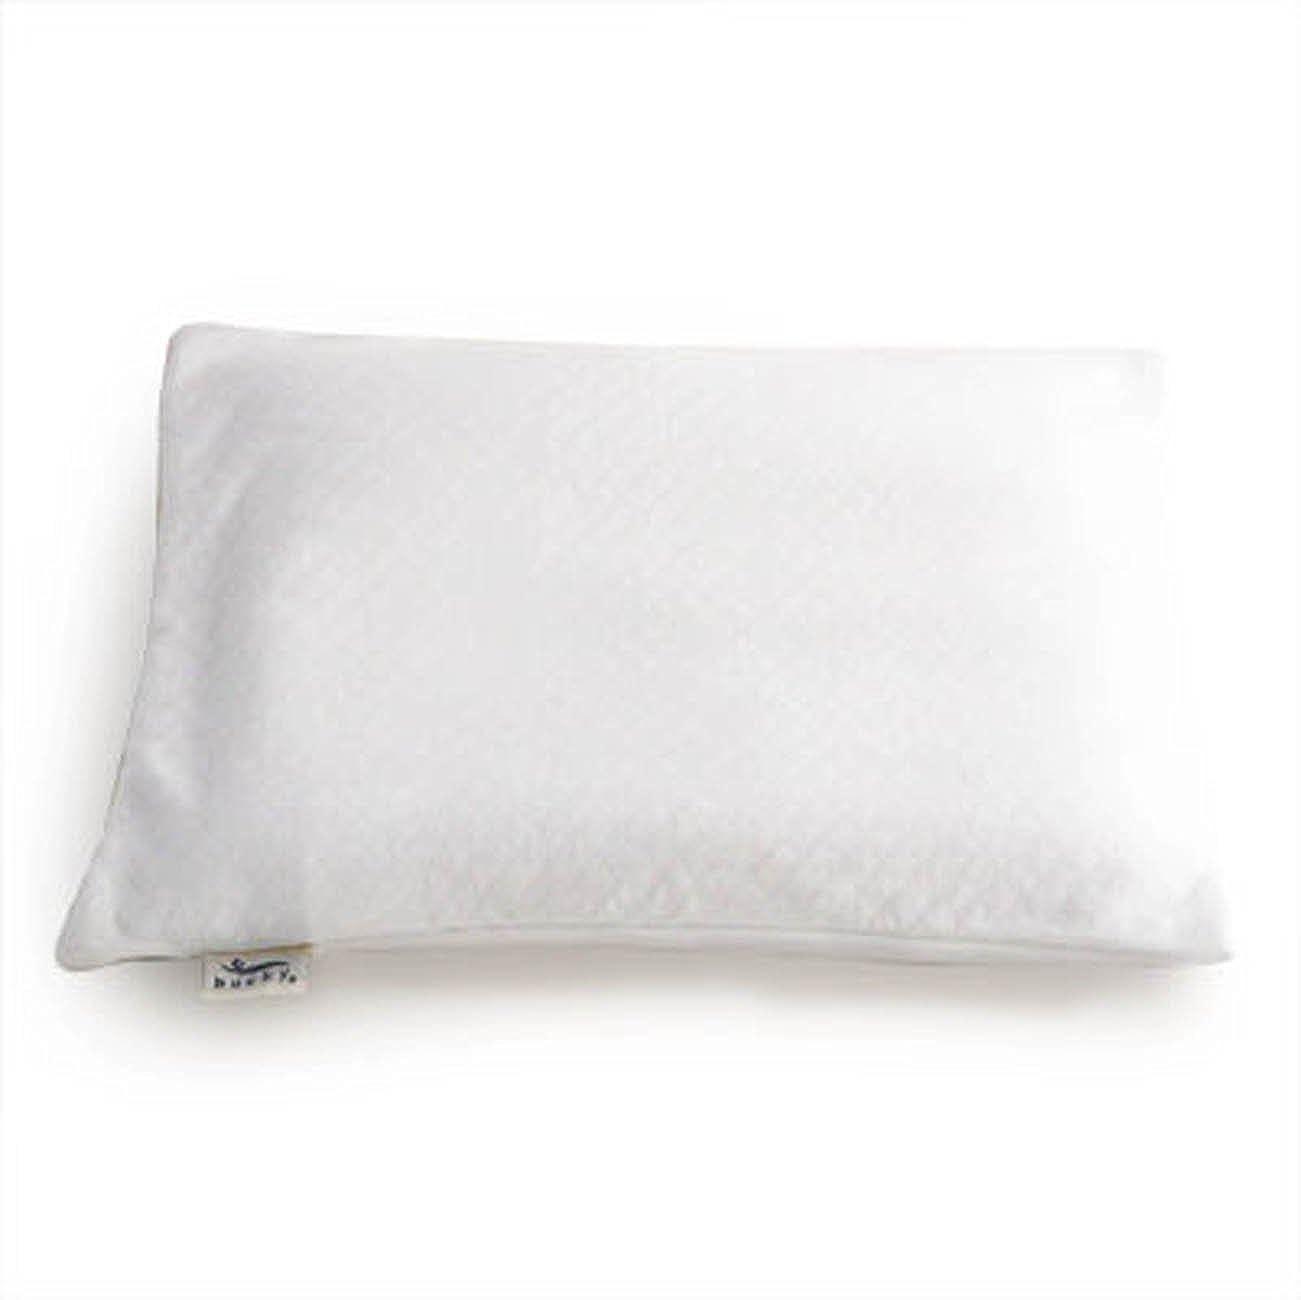 Inch Bucky Travel Duo Pillow B630BWH-White-11 x 14